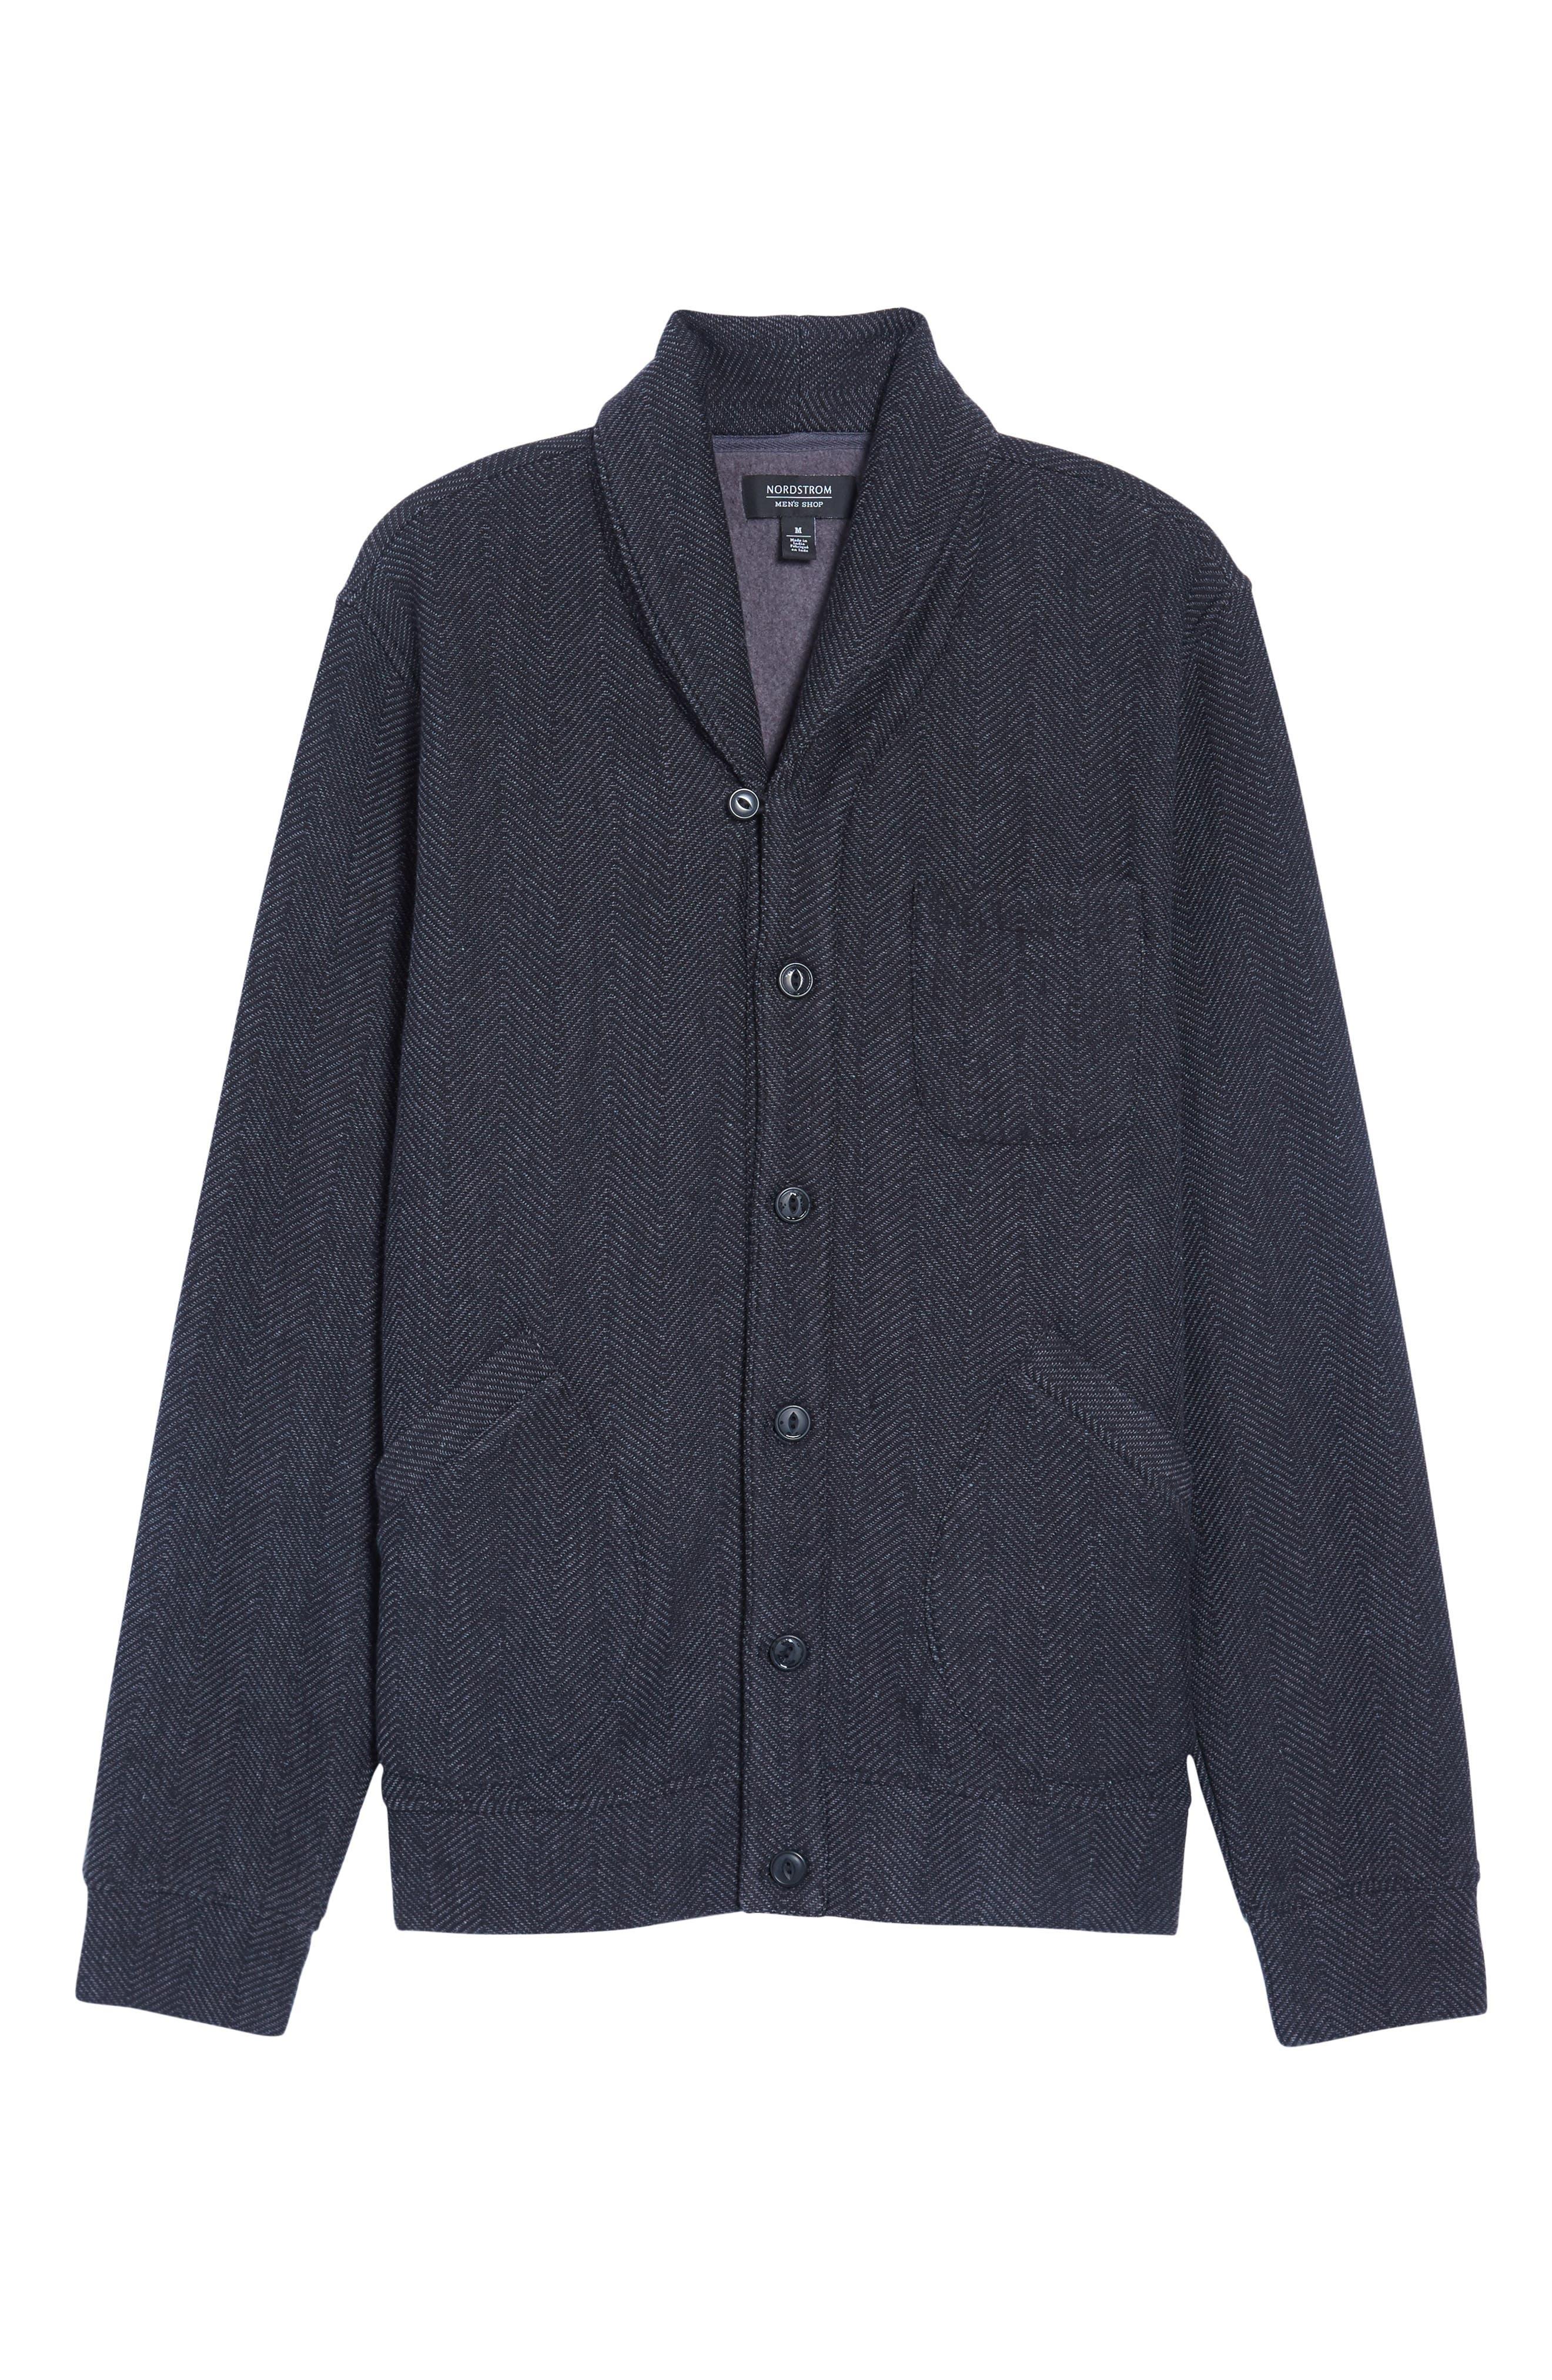 Fleece Lined Shawl Collar Cardigan,                             Alternate thumbnail 6, color,                             021